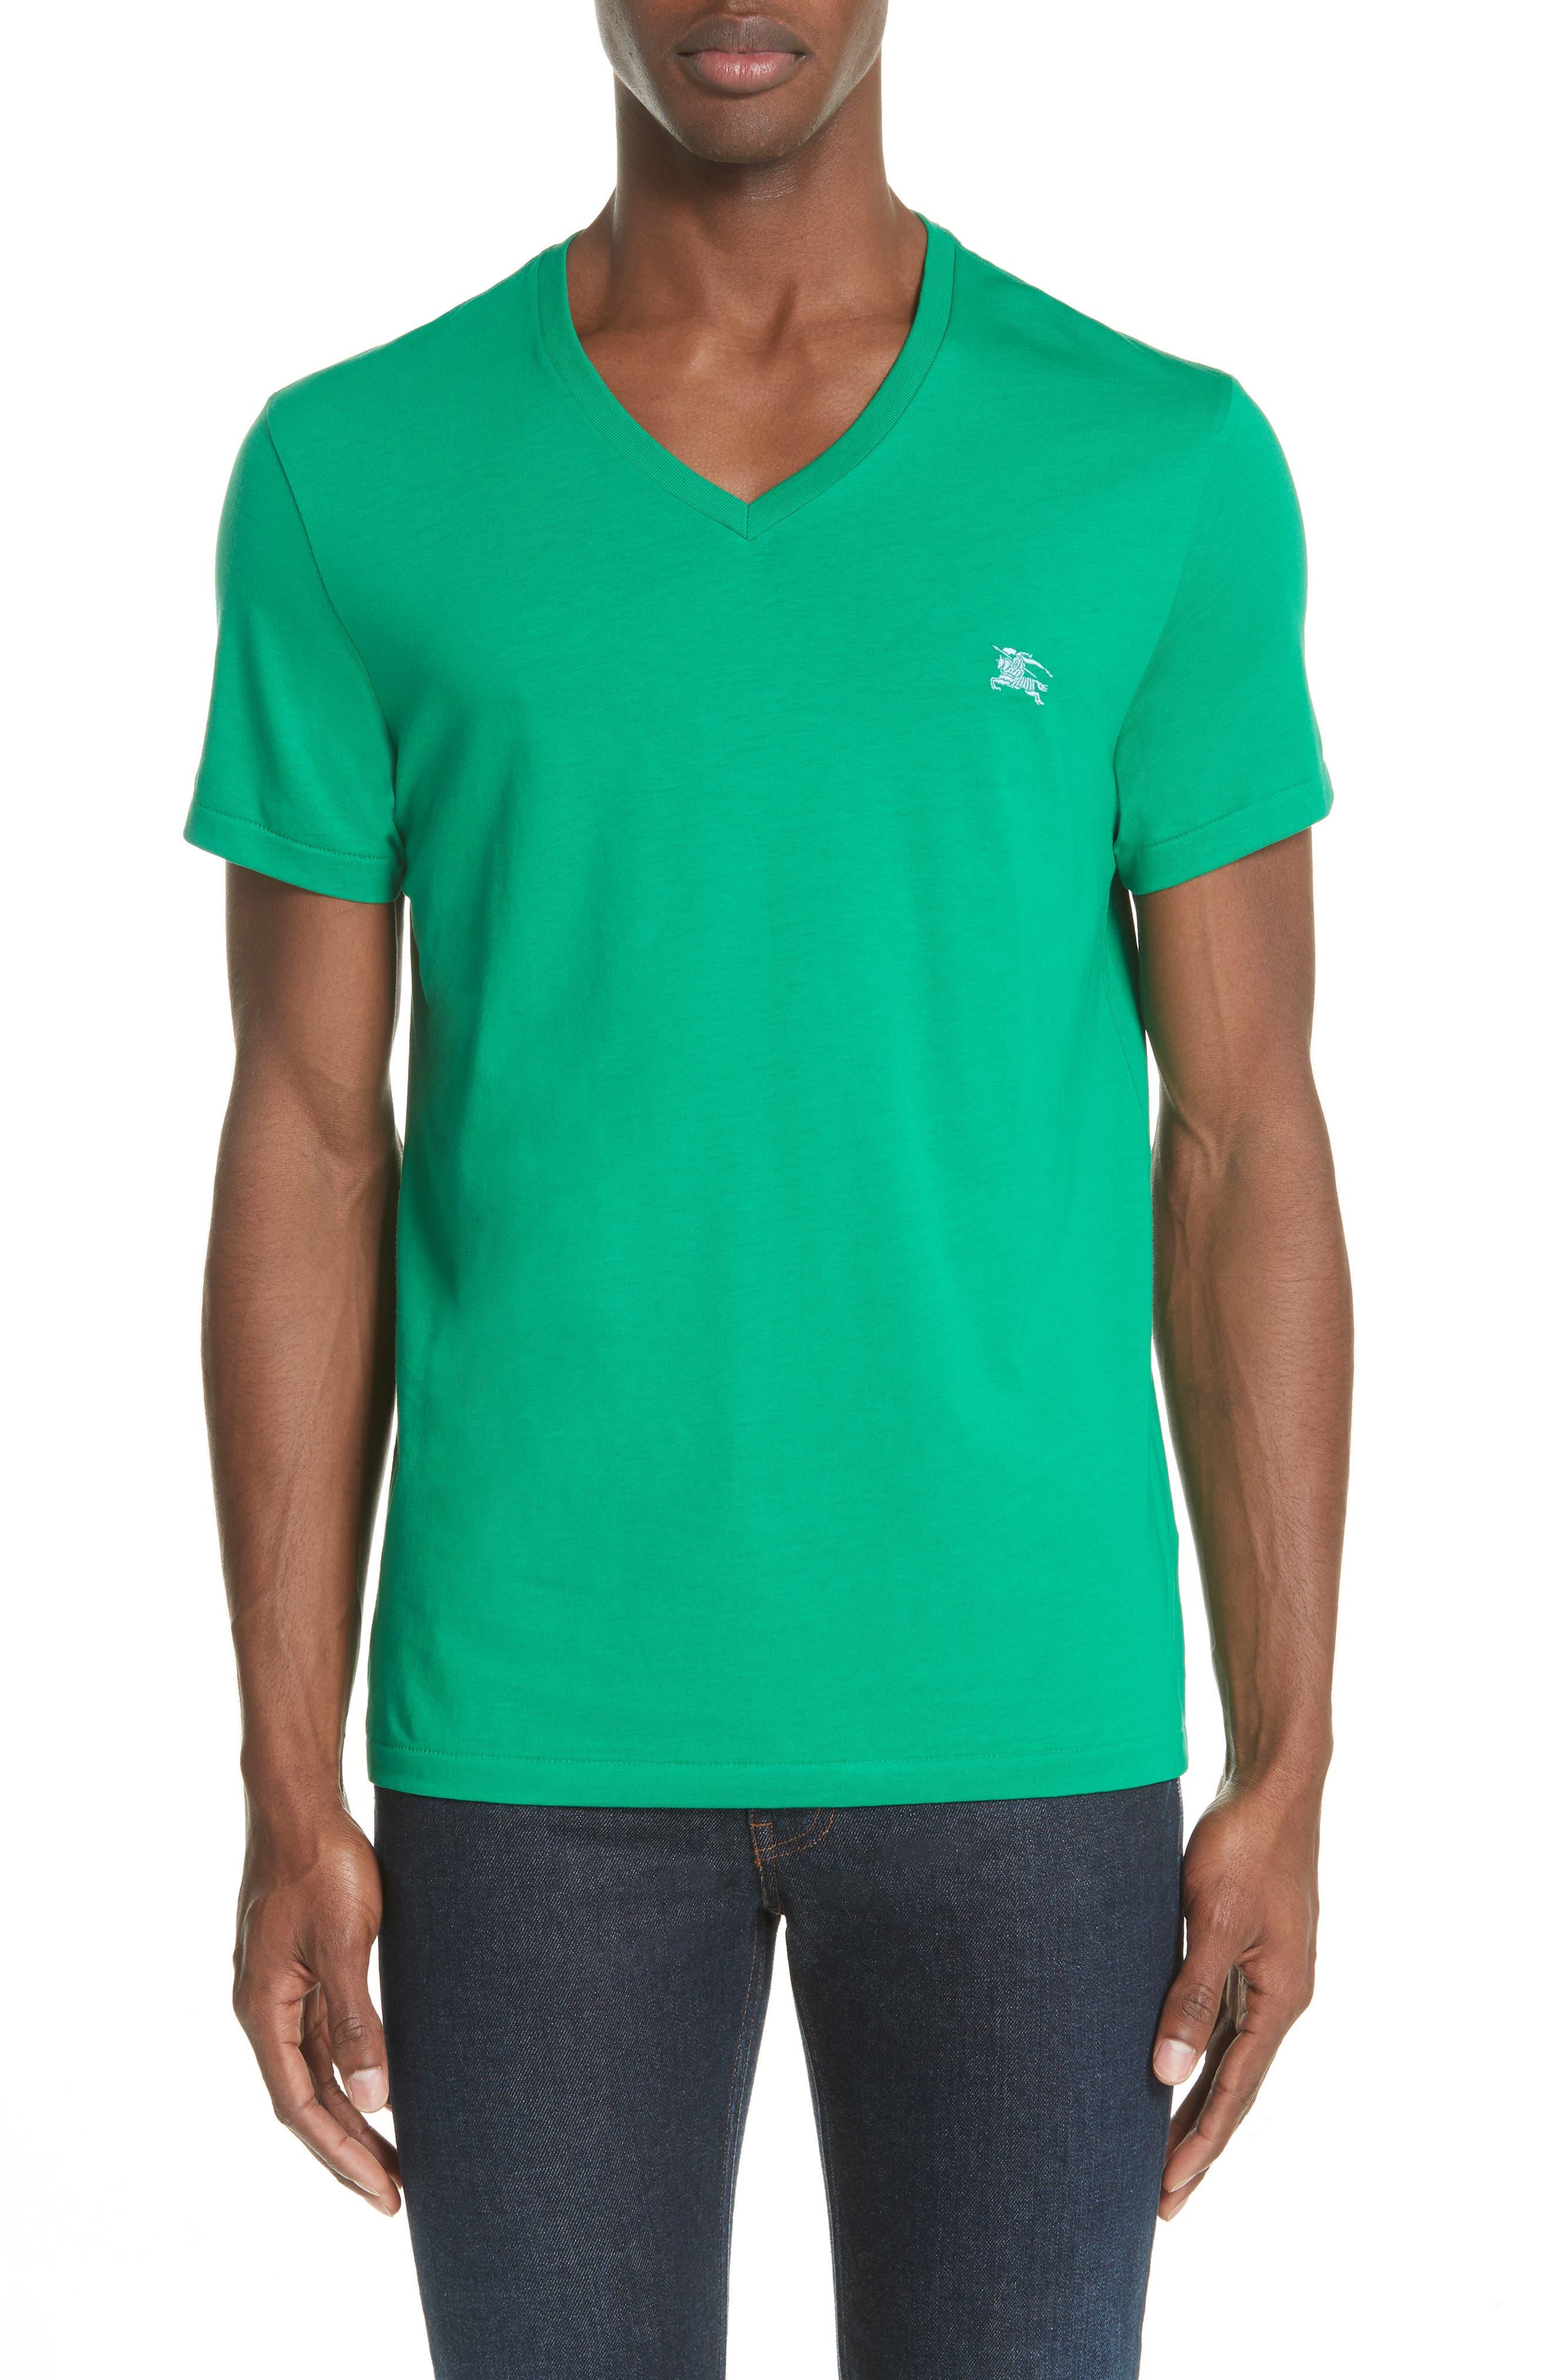 Jadford V-Neck T-Shirt,                             Main thumbnail 1, color,                             Bright Green